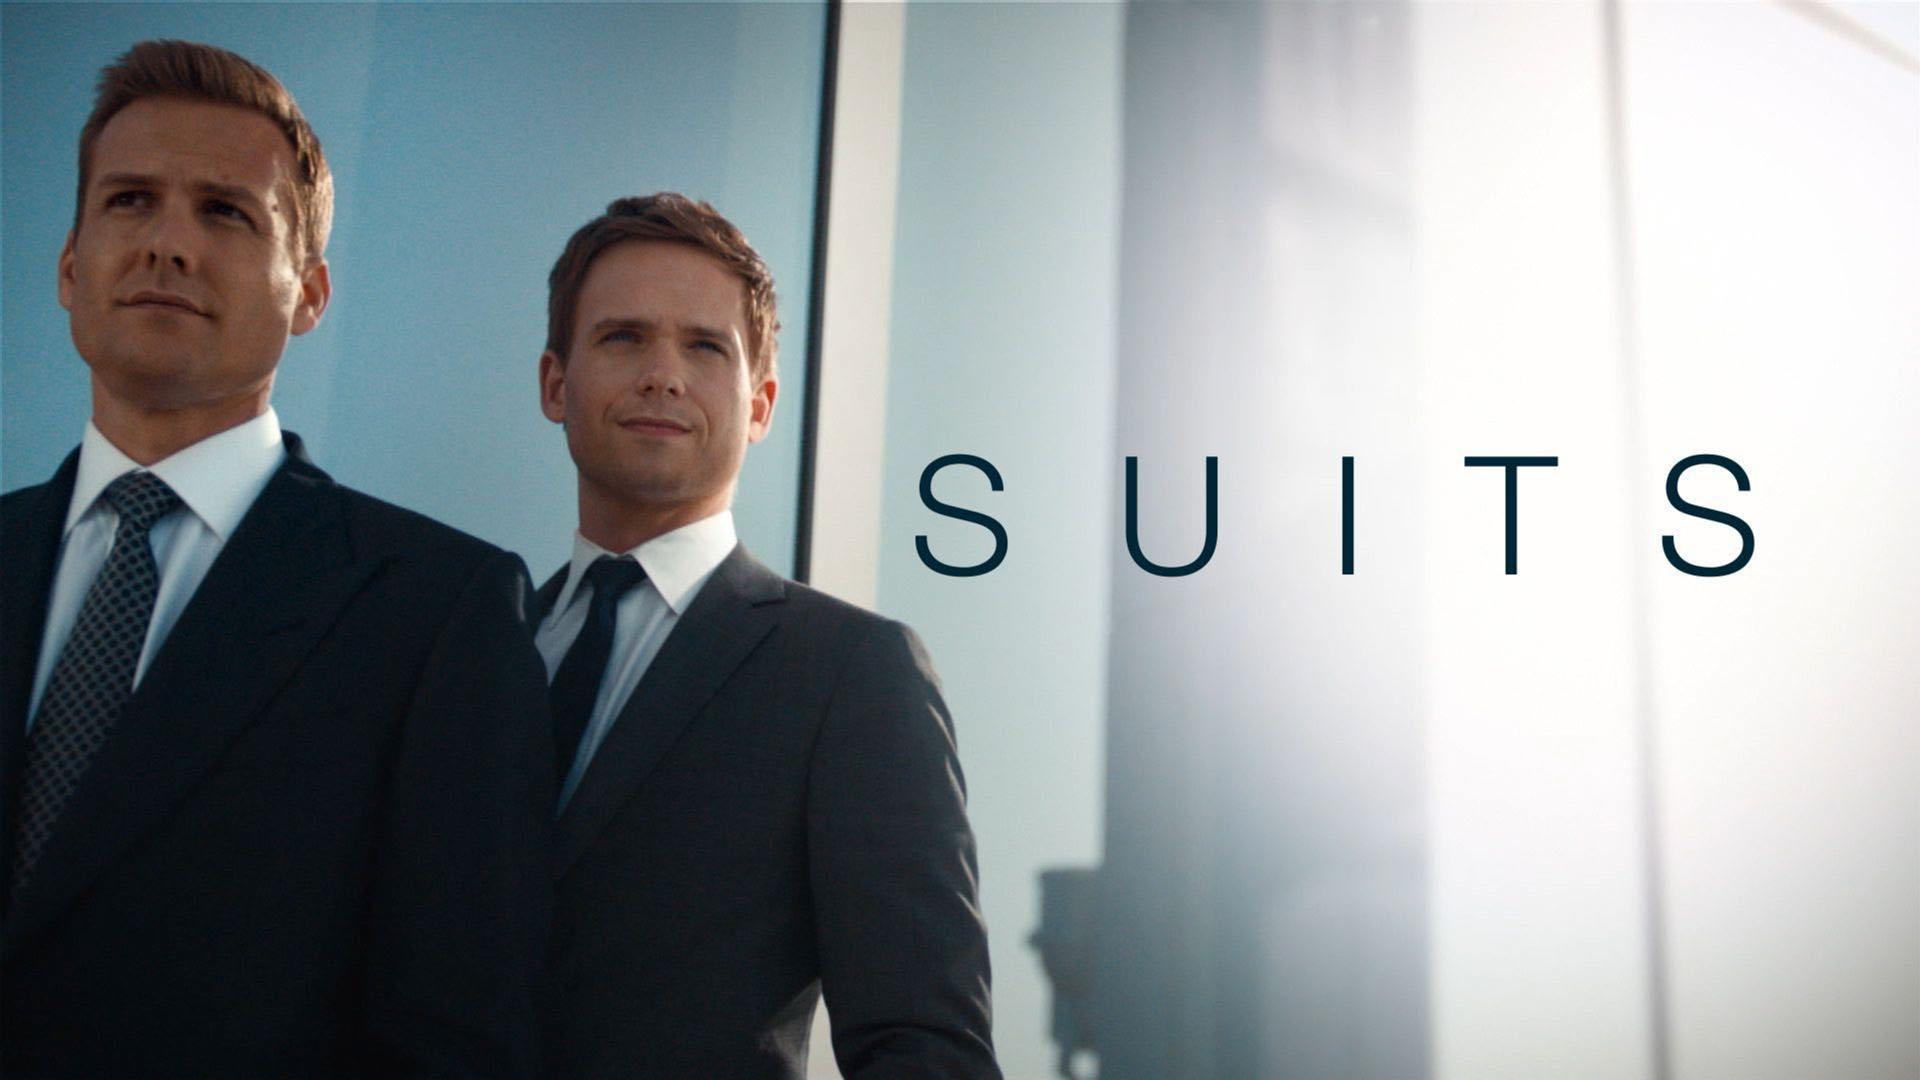 Suits - W garniturach tapeta4